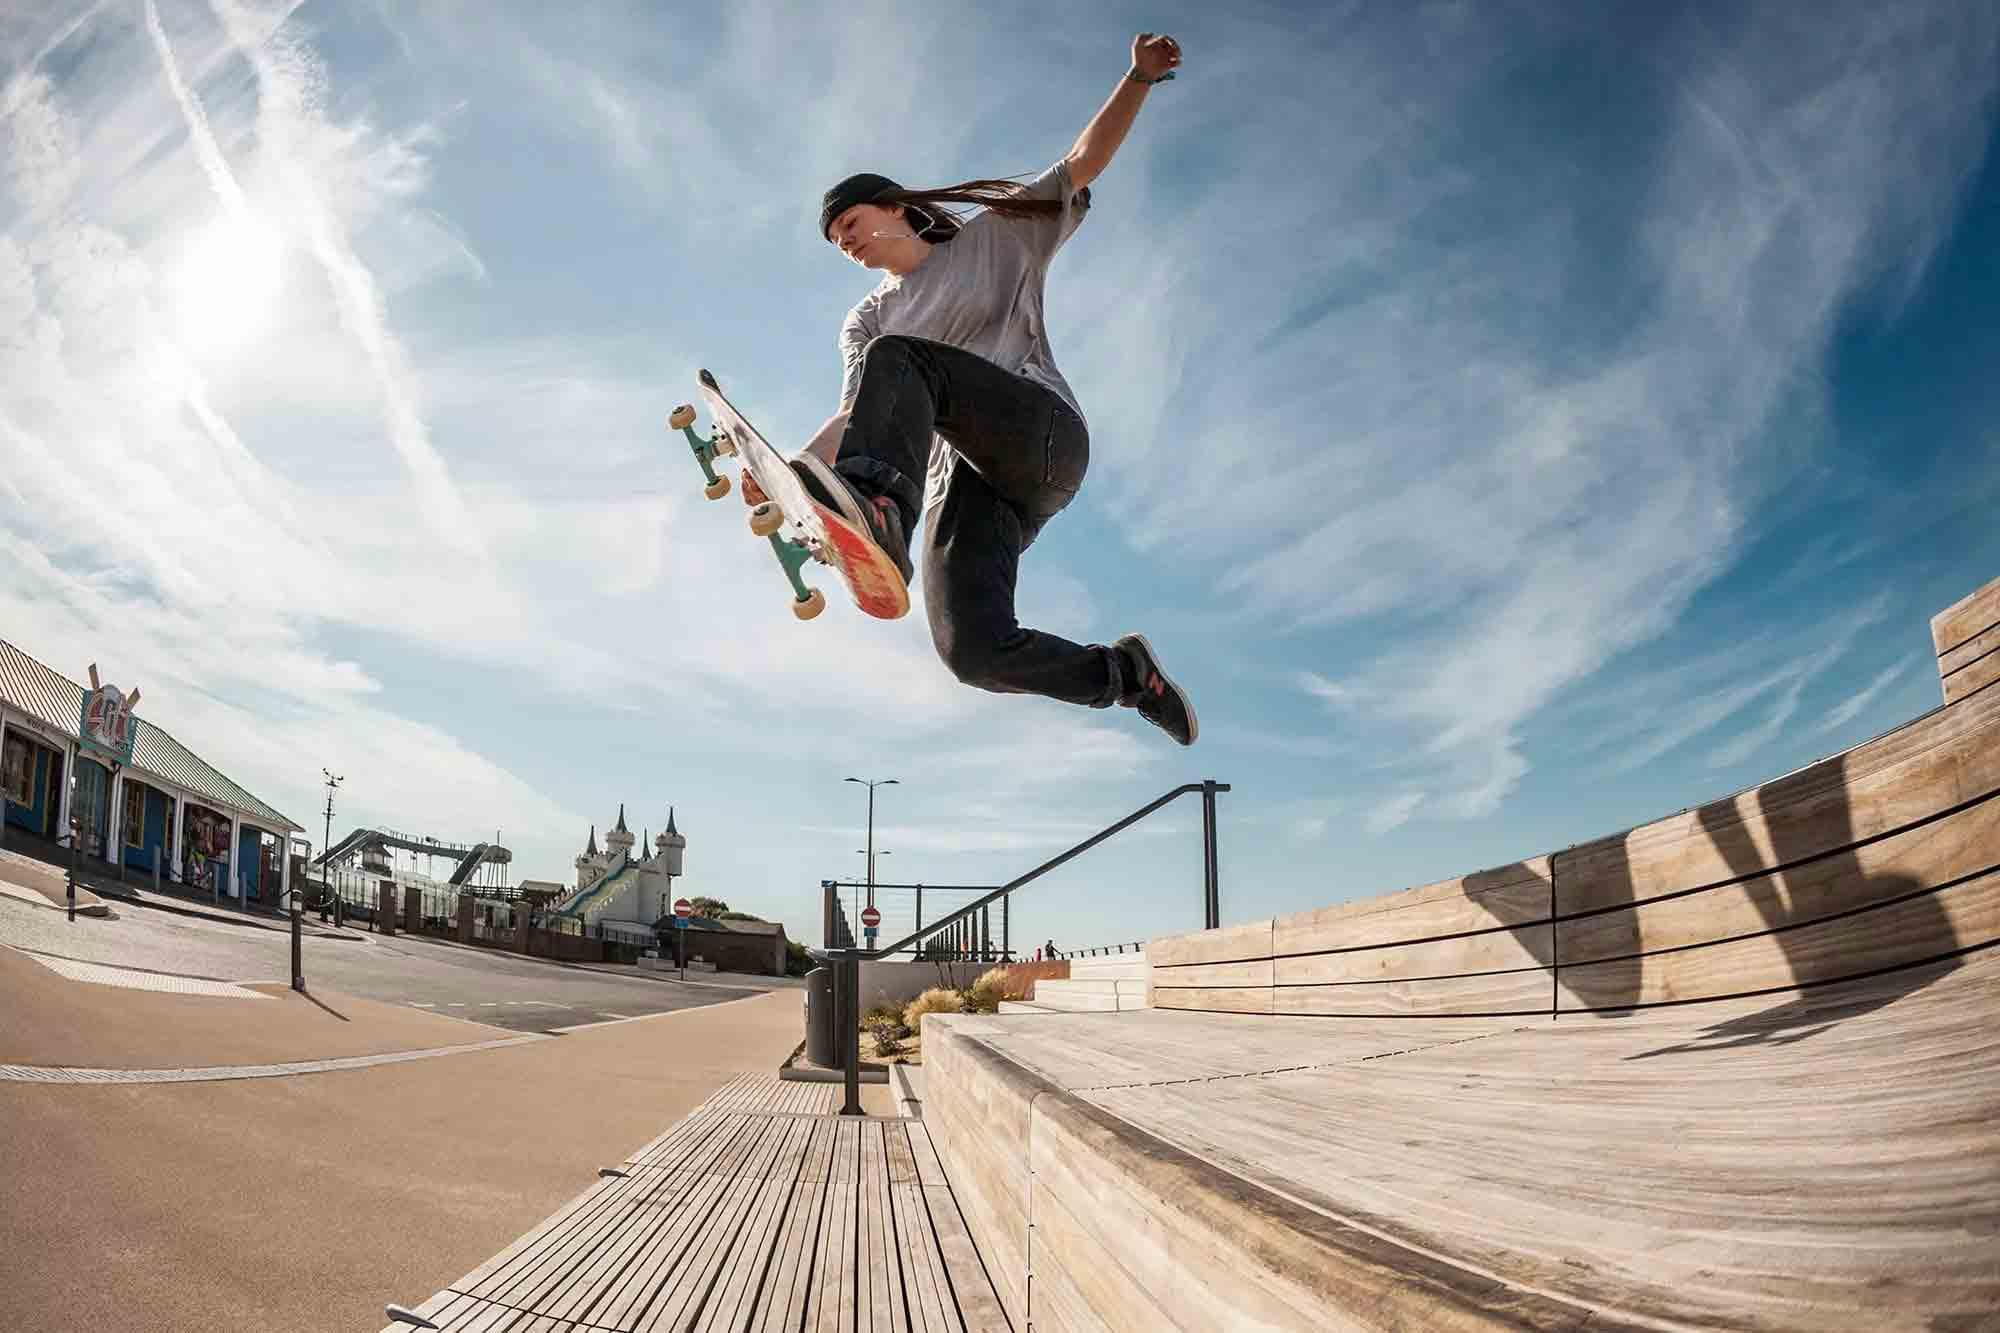 Physical endurance _Is Skateboarding Good Exercise For The Body?